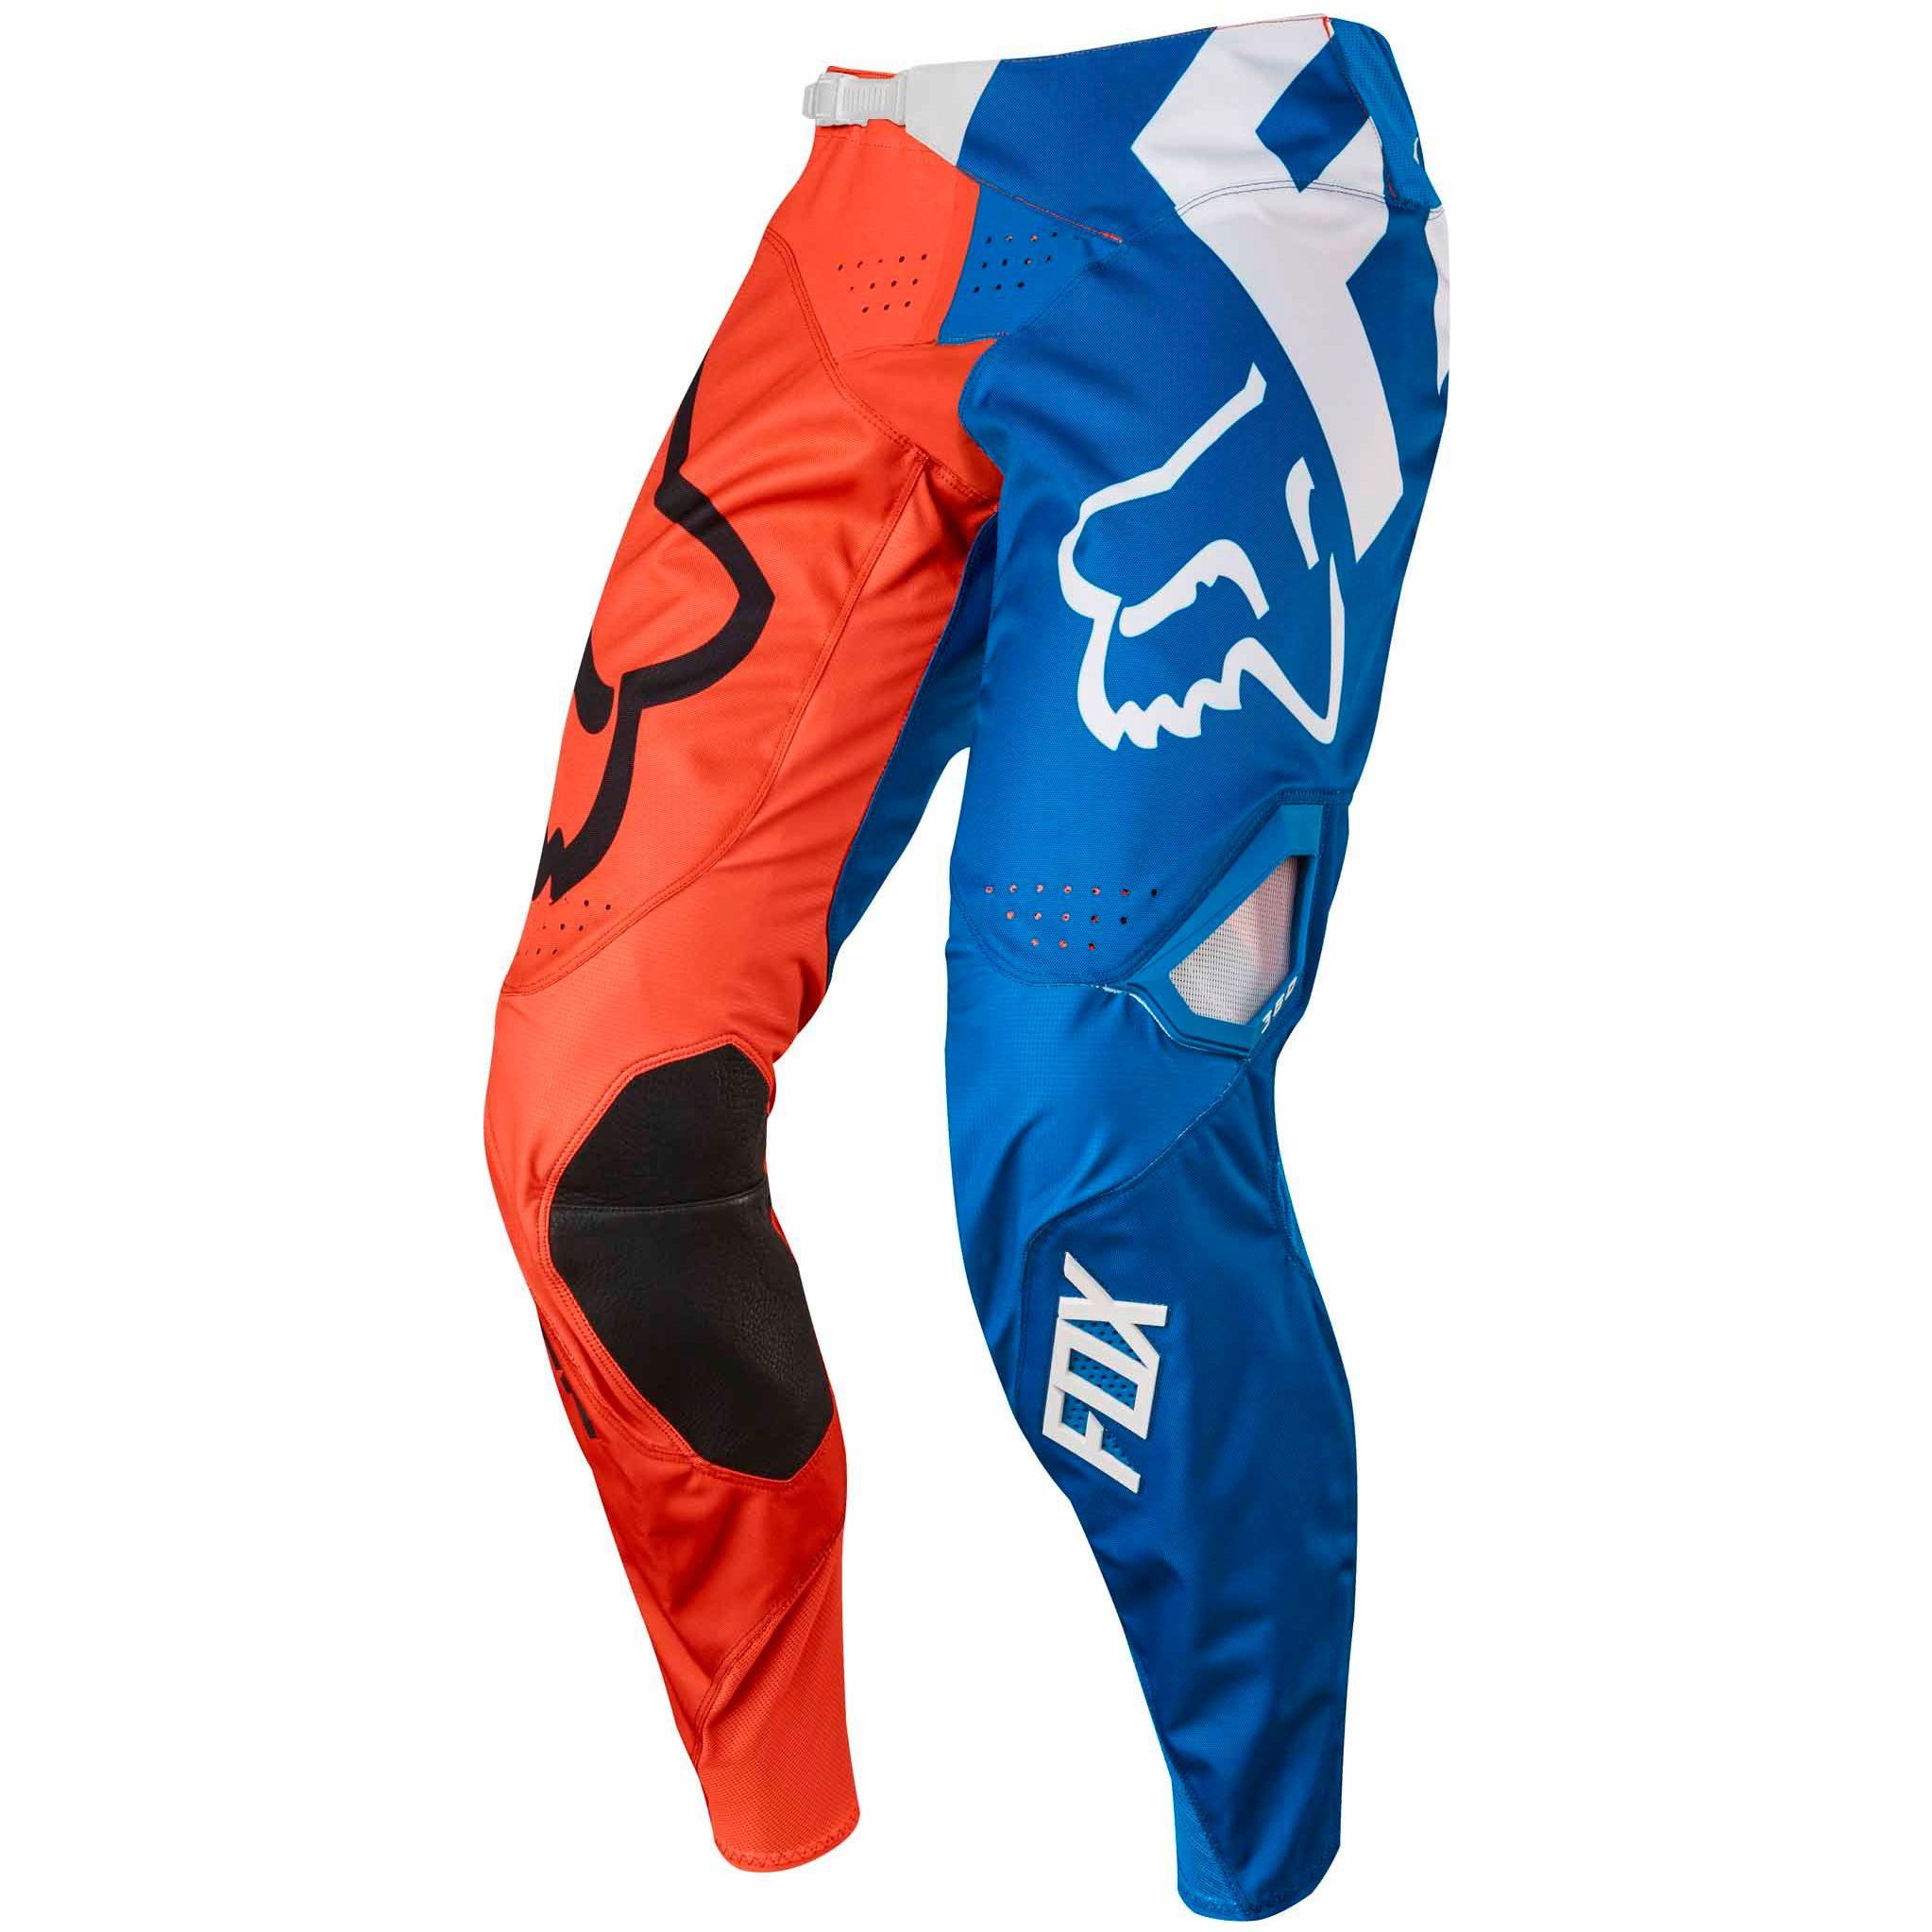 Pantalon De Motocross Fox Outlet 360 Youth Creo Blanco Amarillo Equipacion Off Road Piloto Motoblouz Es